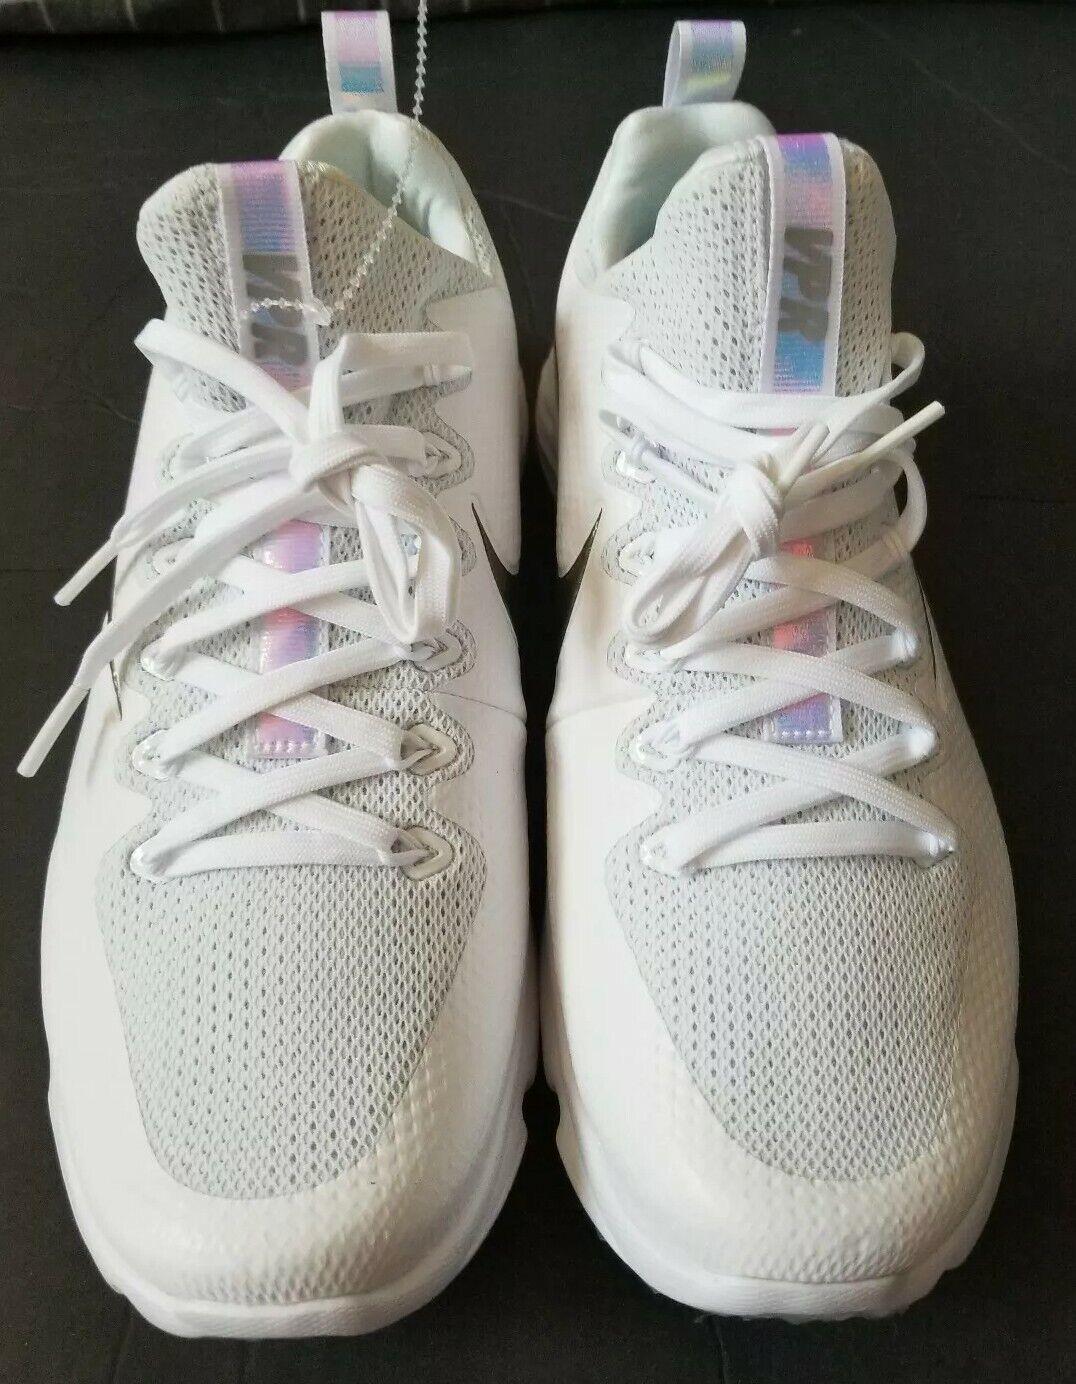 Nike Vapor Mens Speed Turf Trainer Superbowl LII White 833408-112 833408-112 833408-112 Size 8 NEW affb88